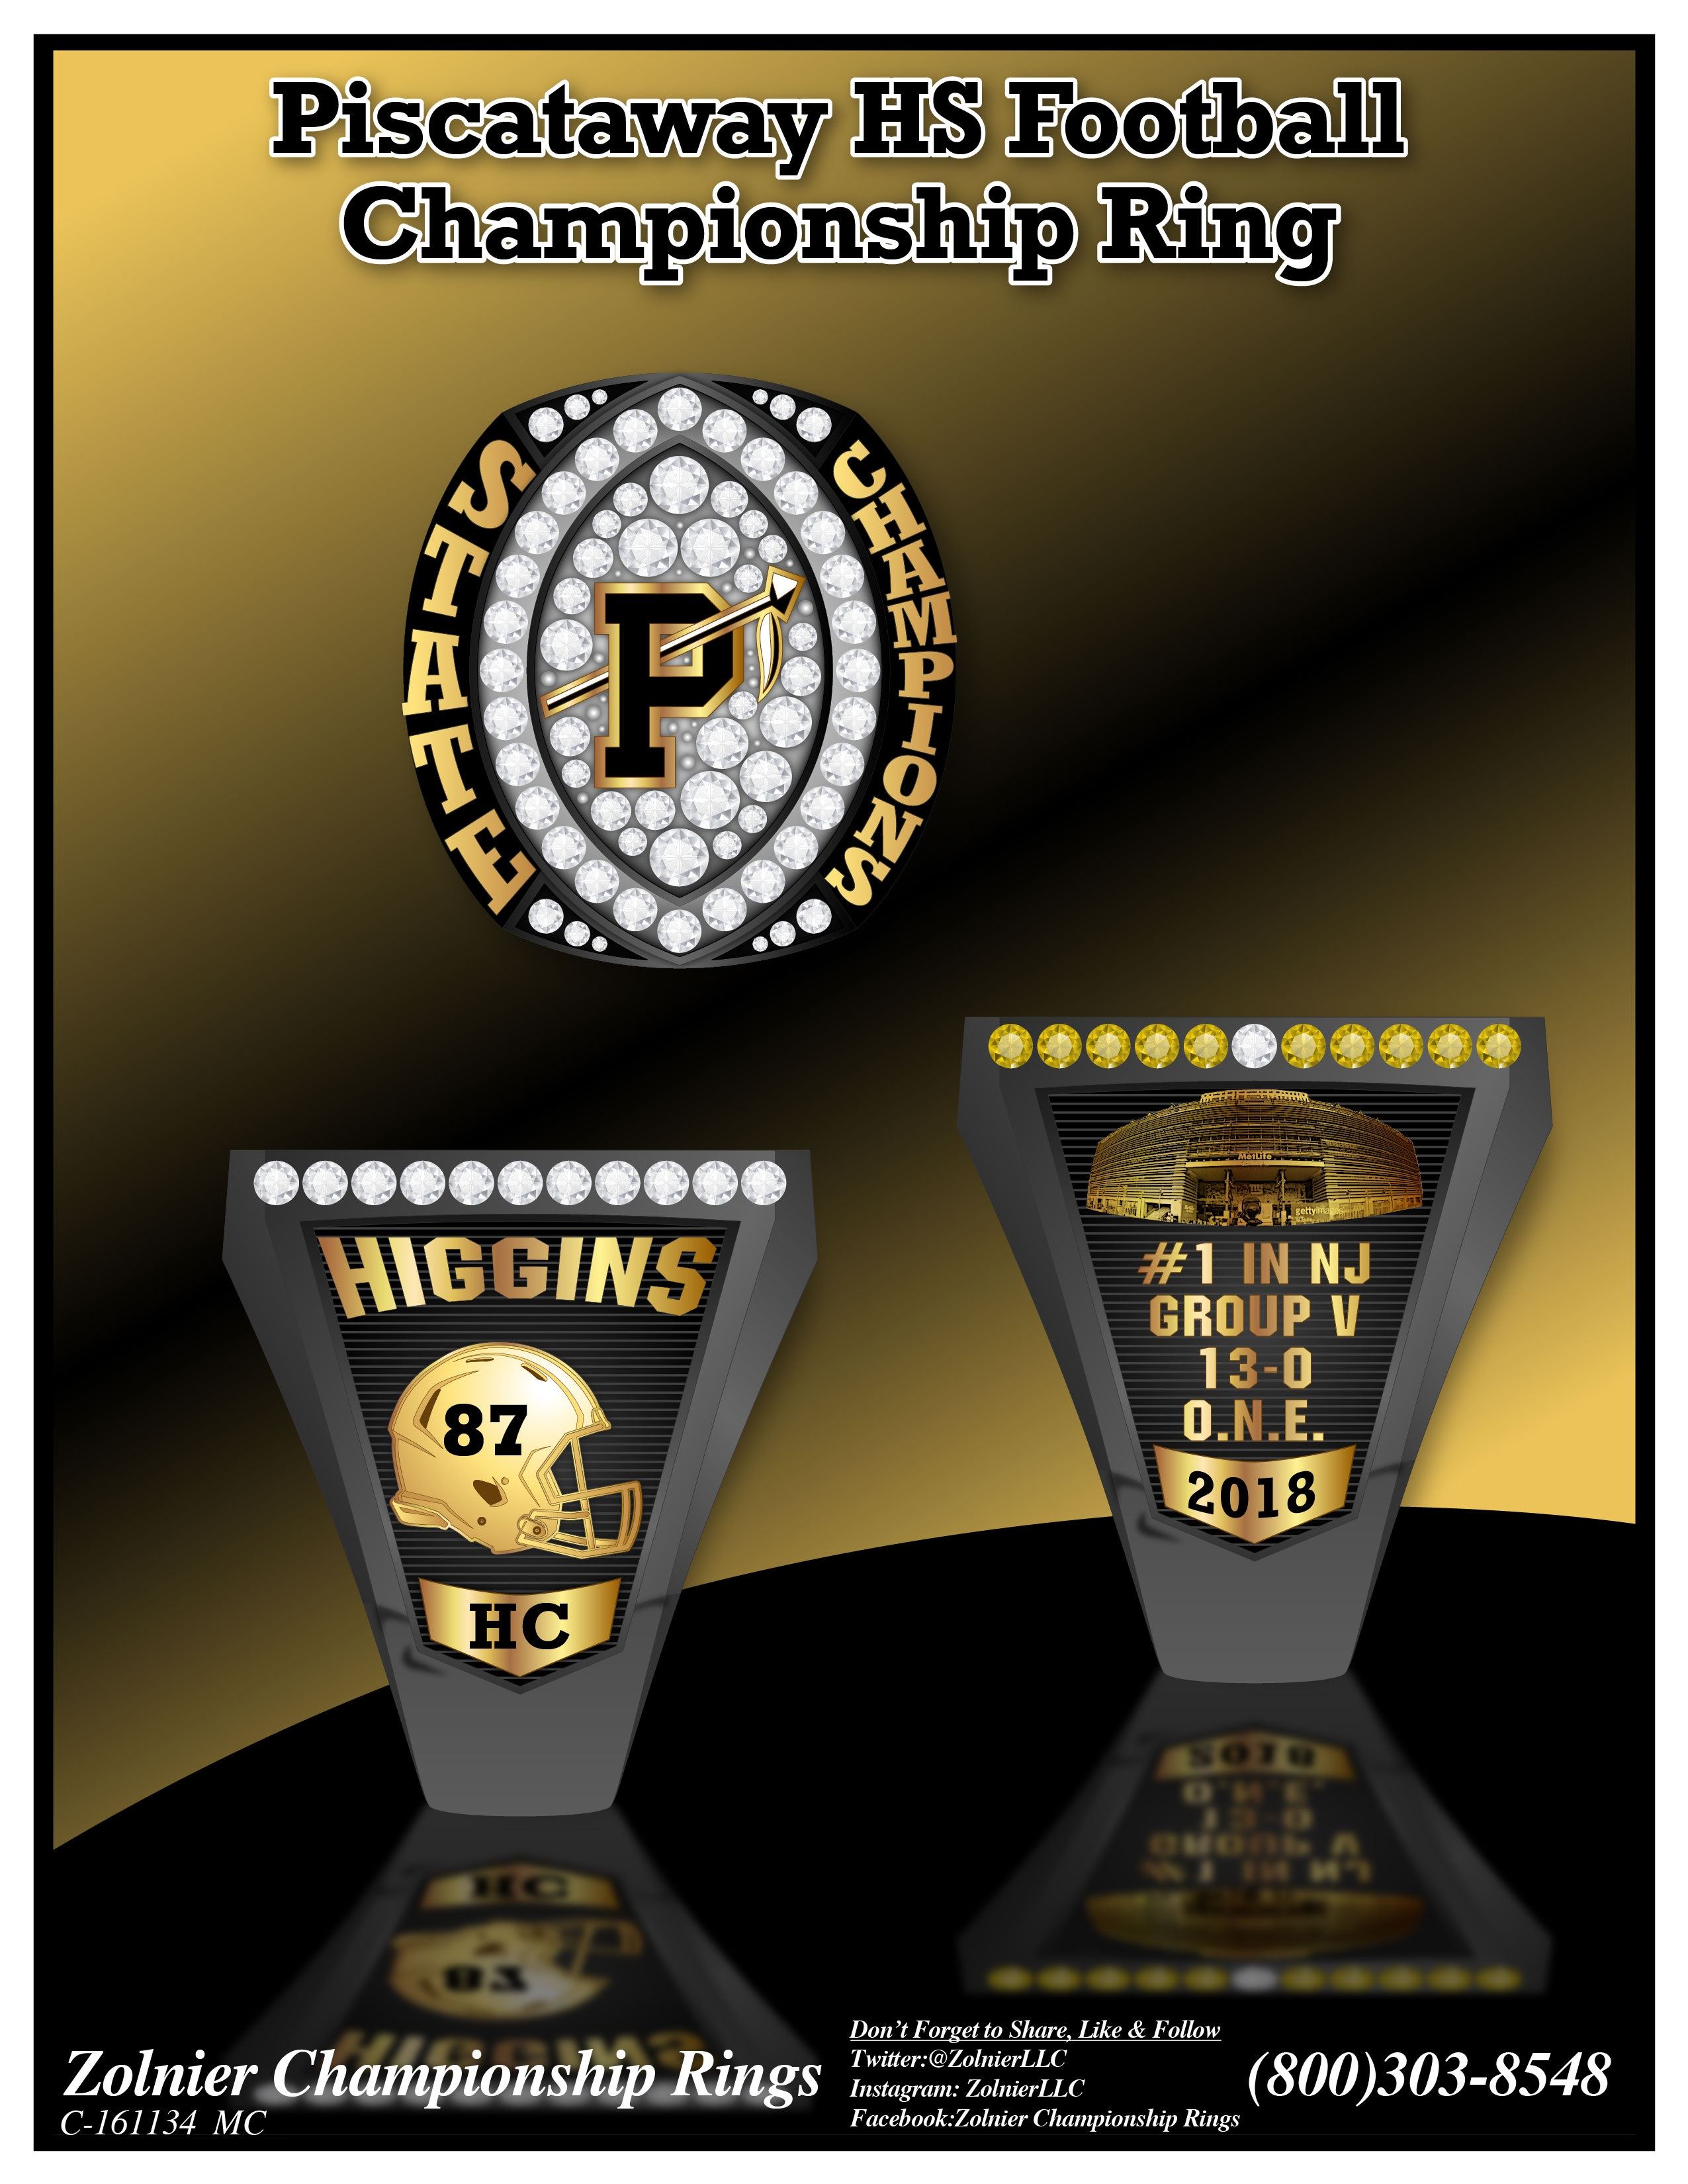 C-157568 Piscataway HS Football Champ Ring - Copy